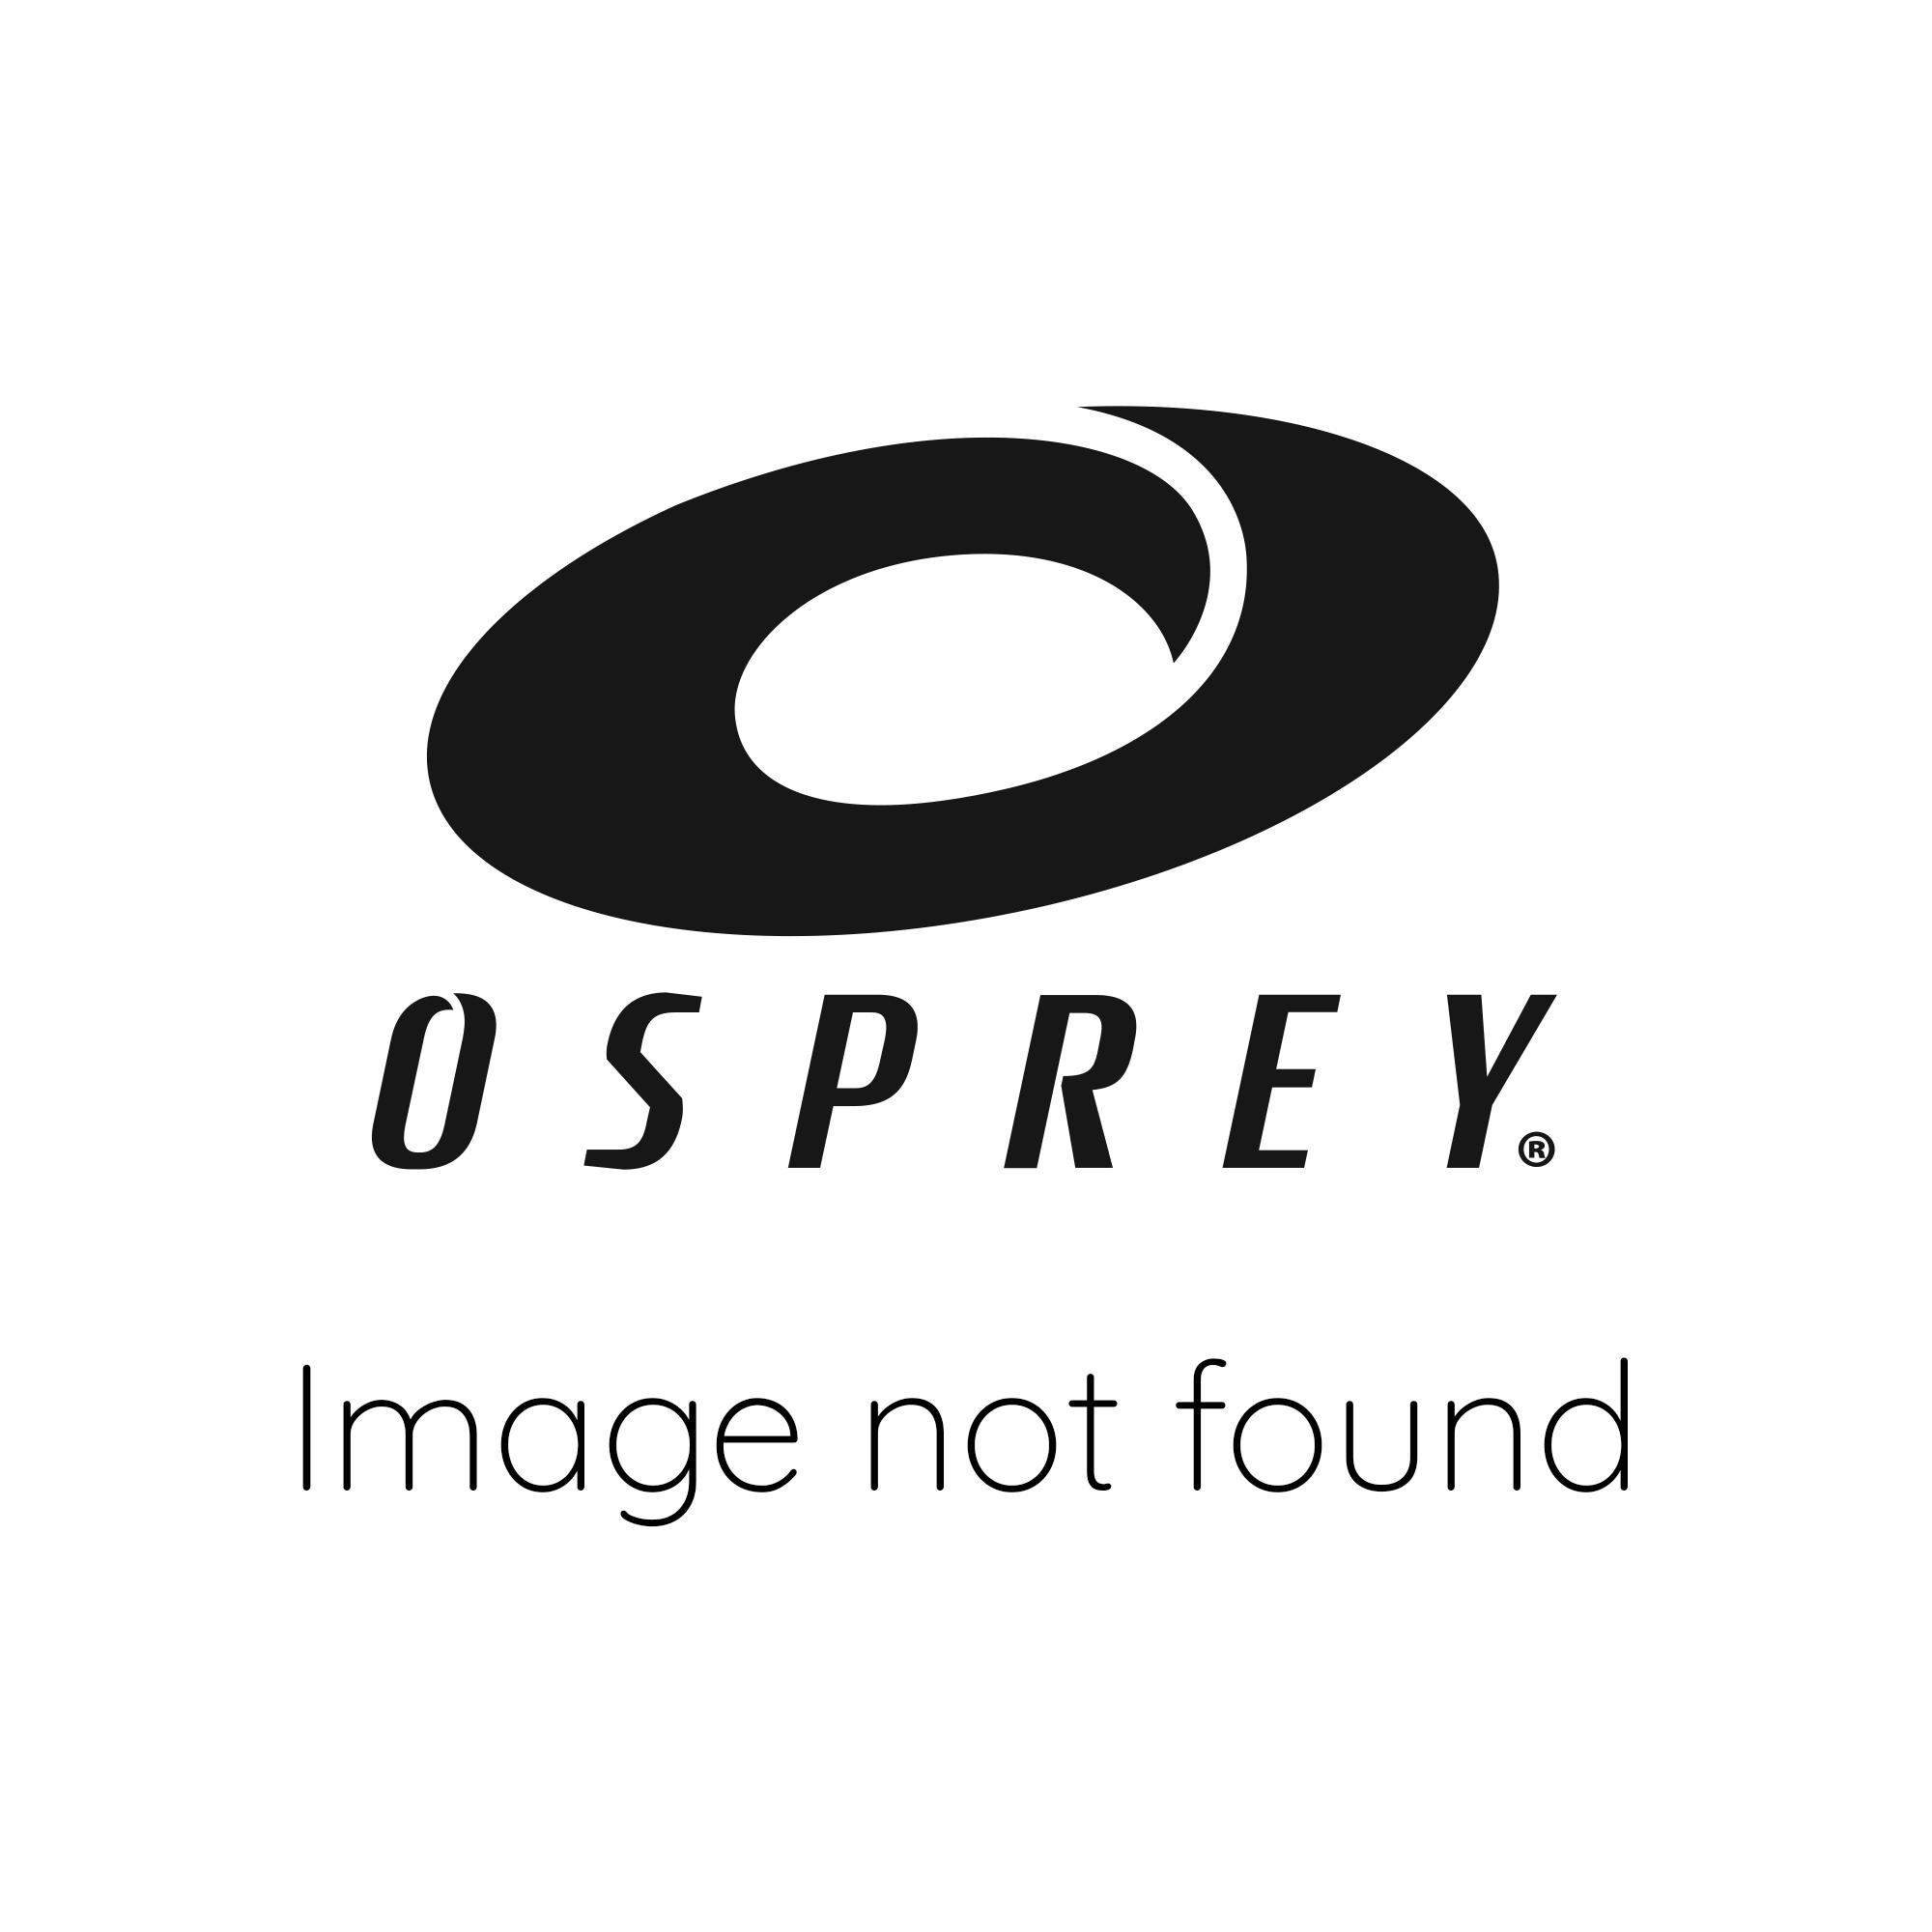 Osprey Womens Triathlon Wetsuit Pro